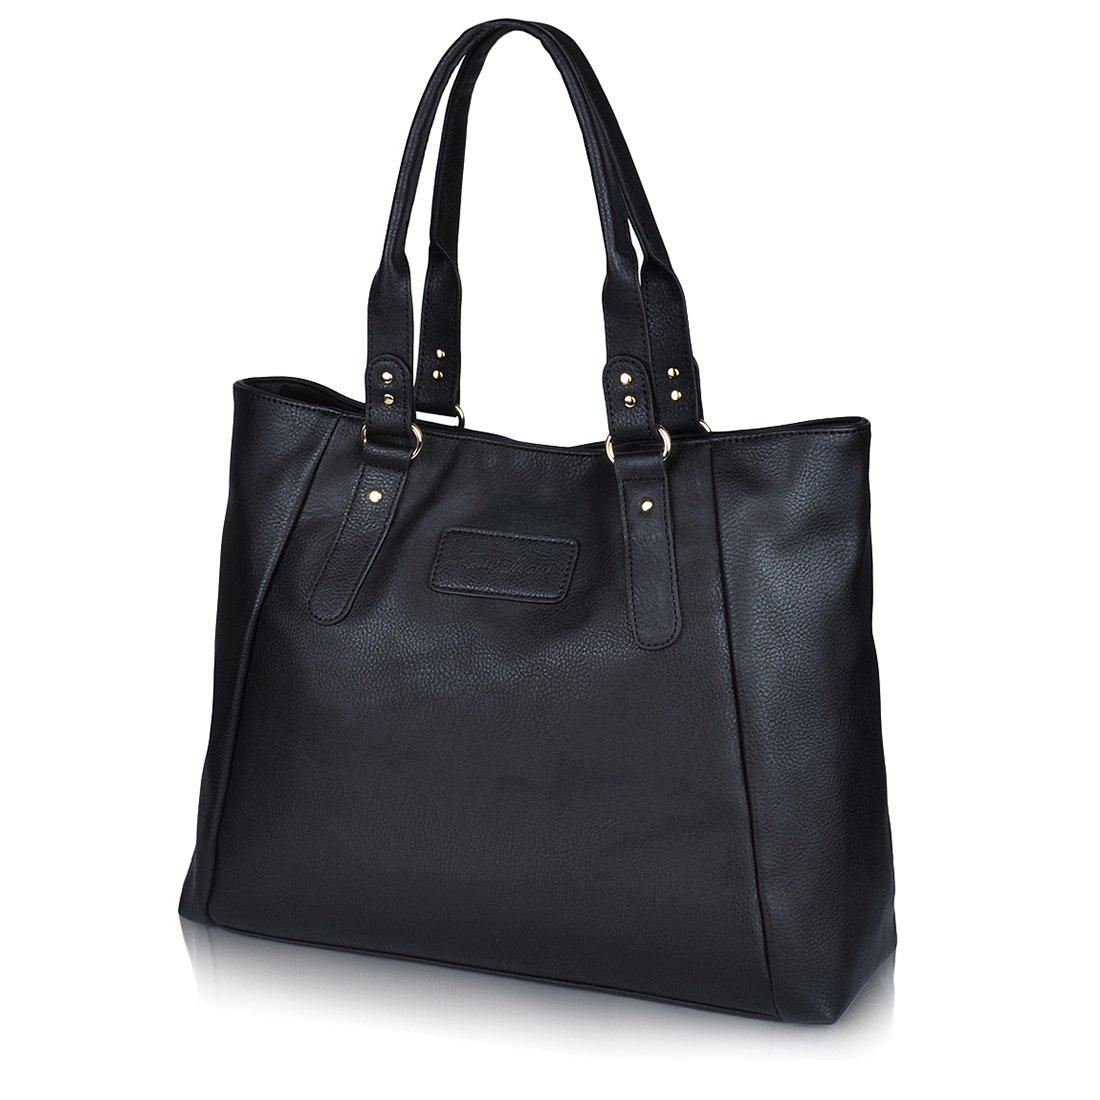 ZMSnow Women's PU Leather Handbags Lightweight Tote Casual Work Bag, 3-black